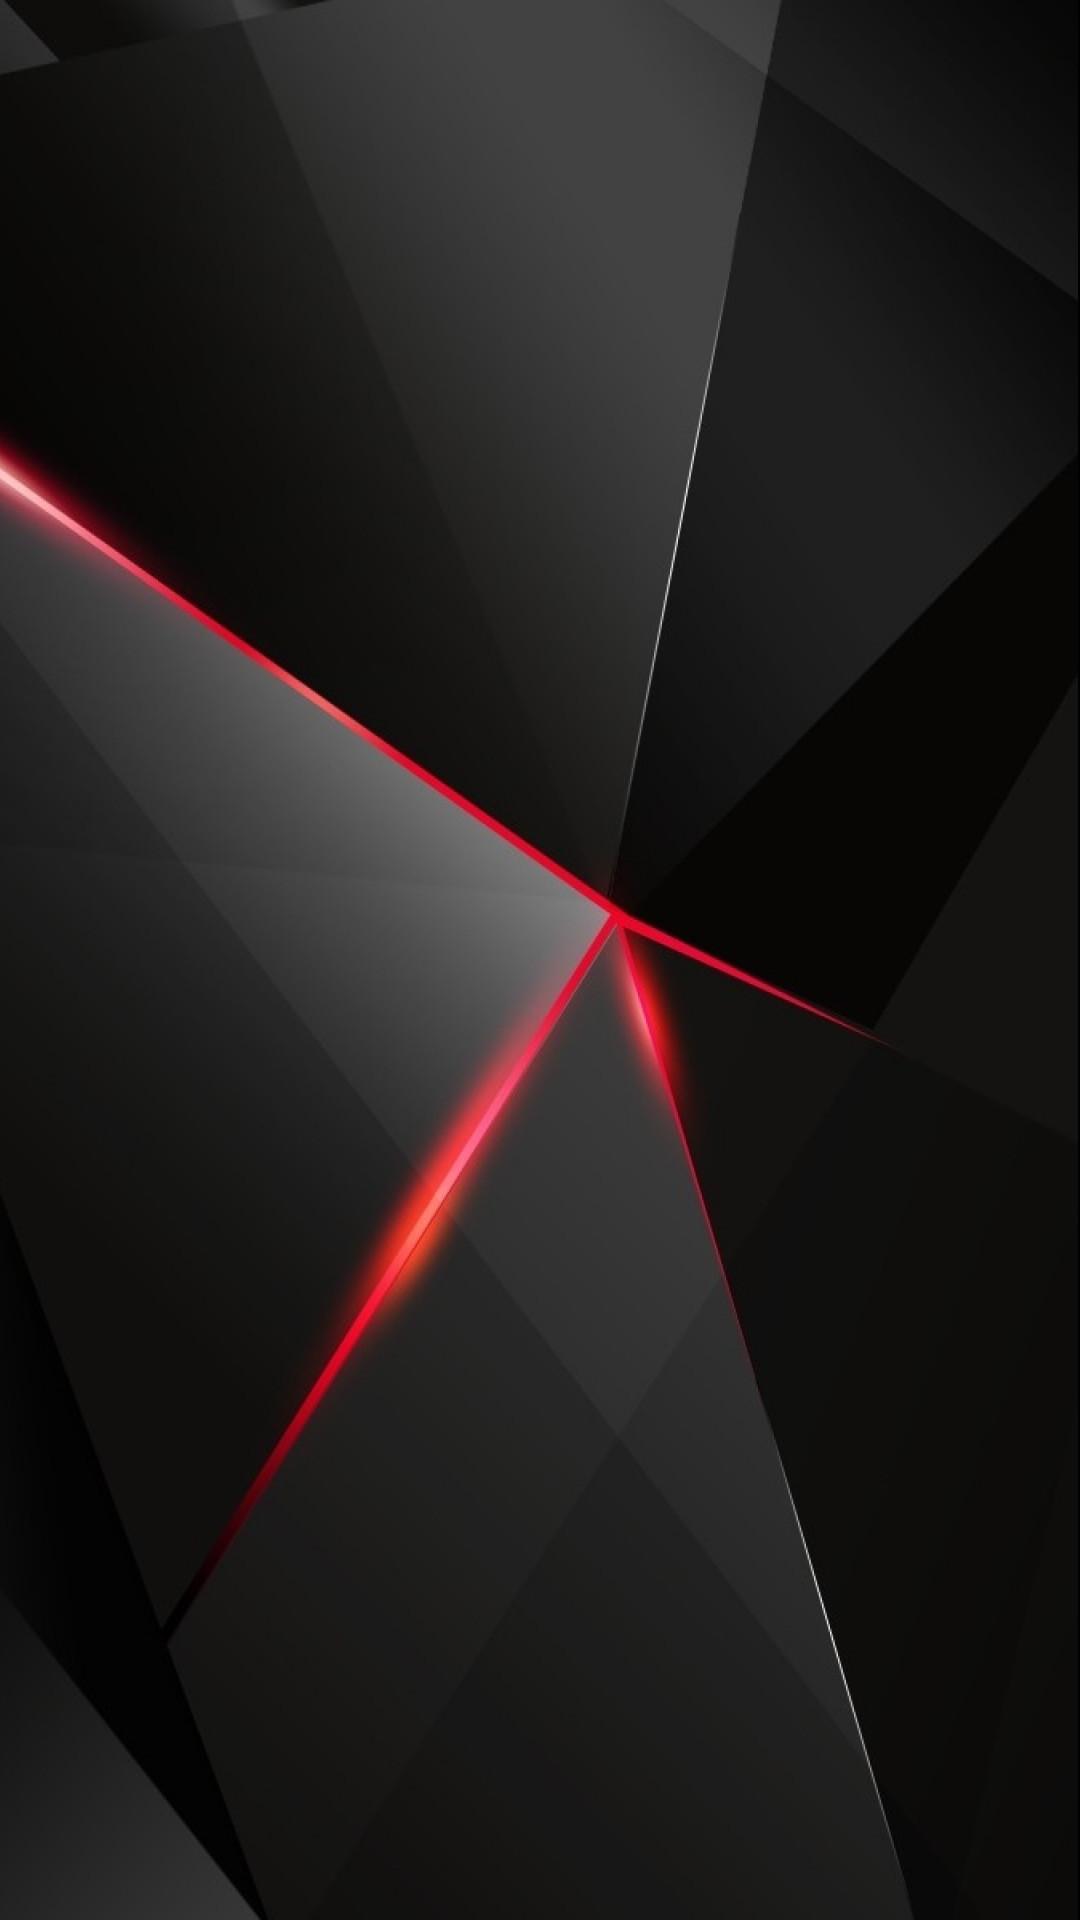 Res: 1080x1920, Nexus Black 1080 x 1920 FHD Wallpaper Nexus Black 1080 x 1920 FHD Wallpaper